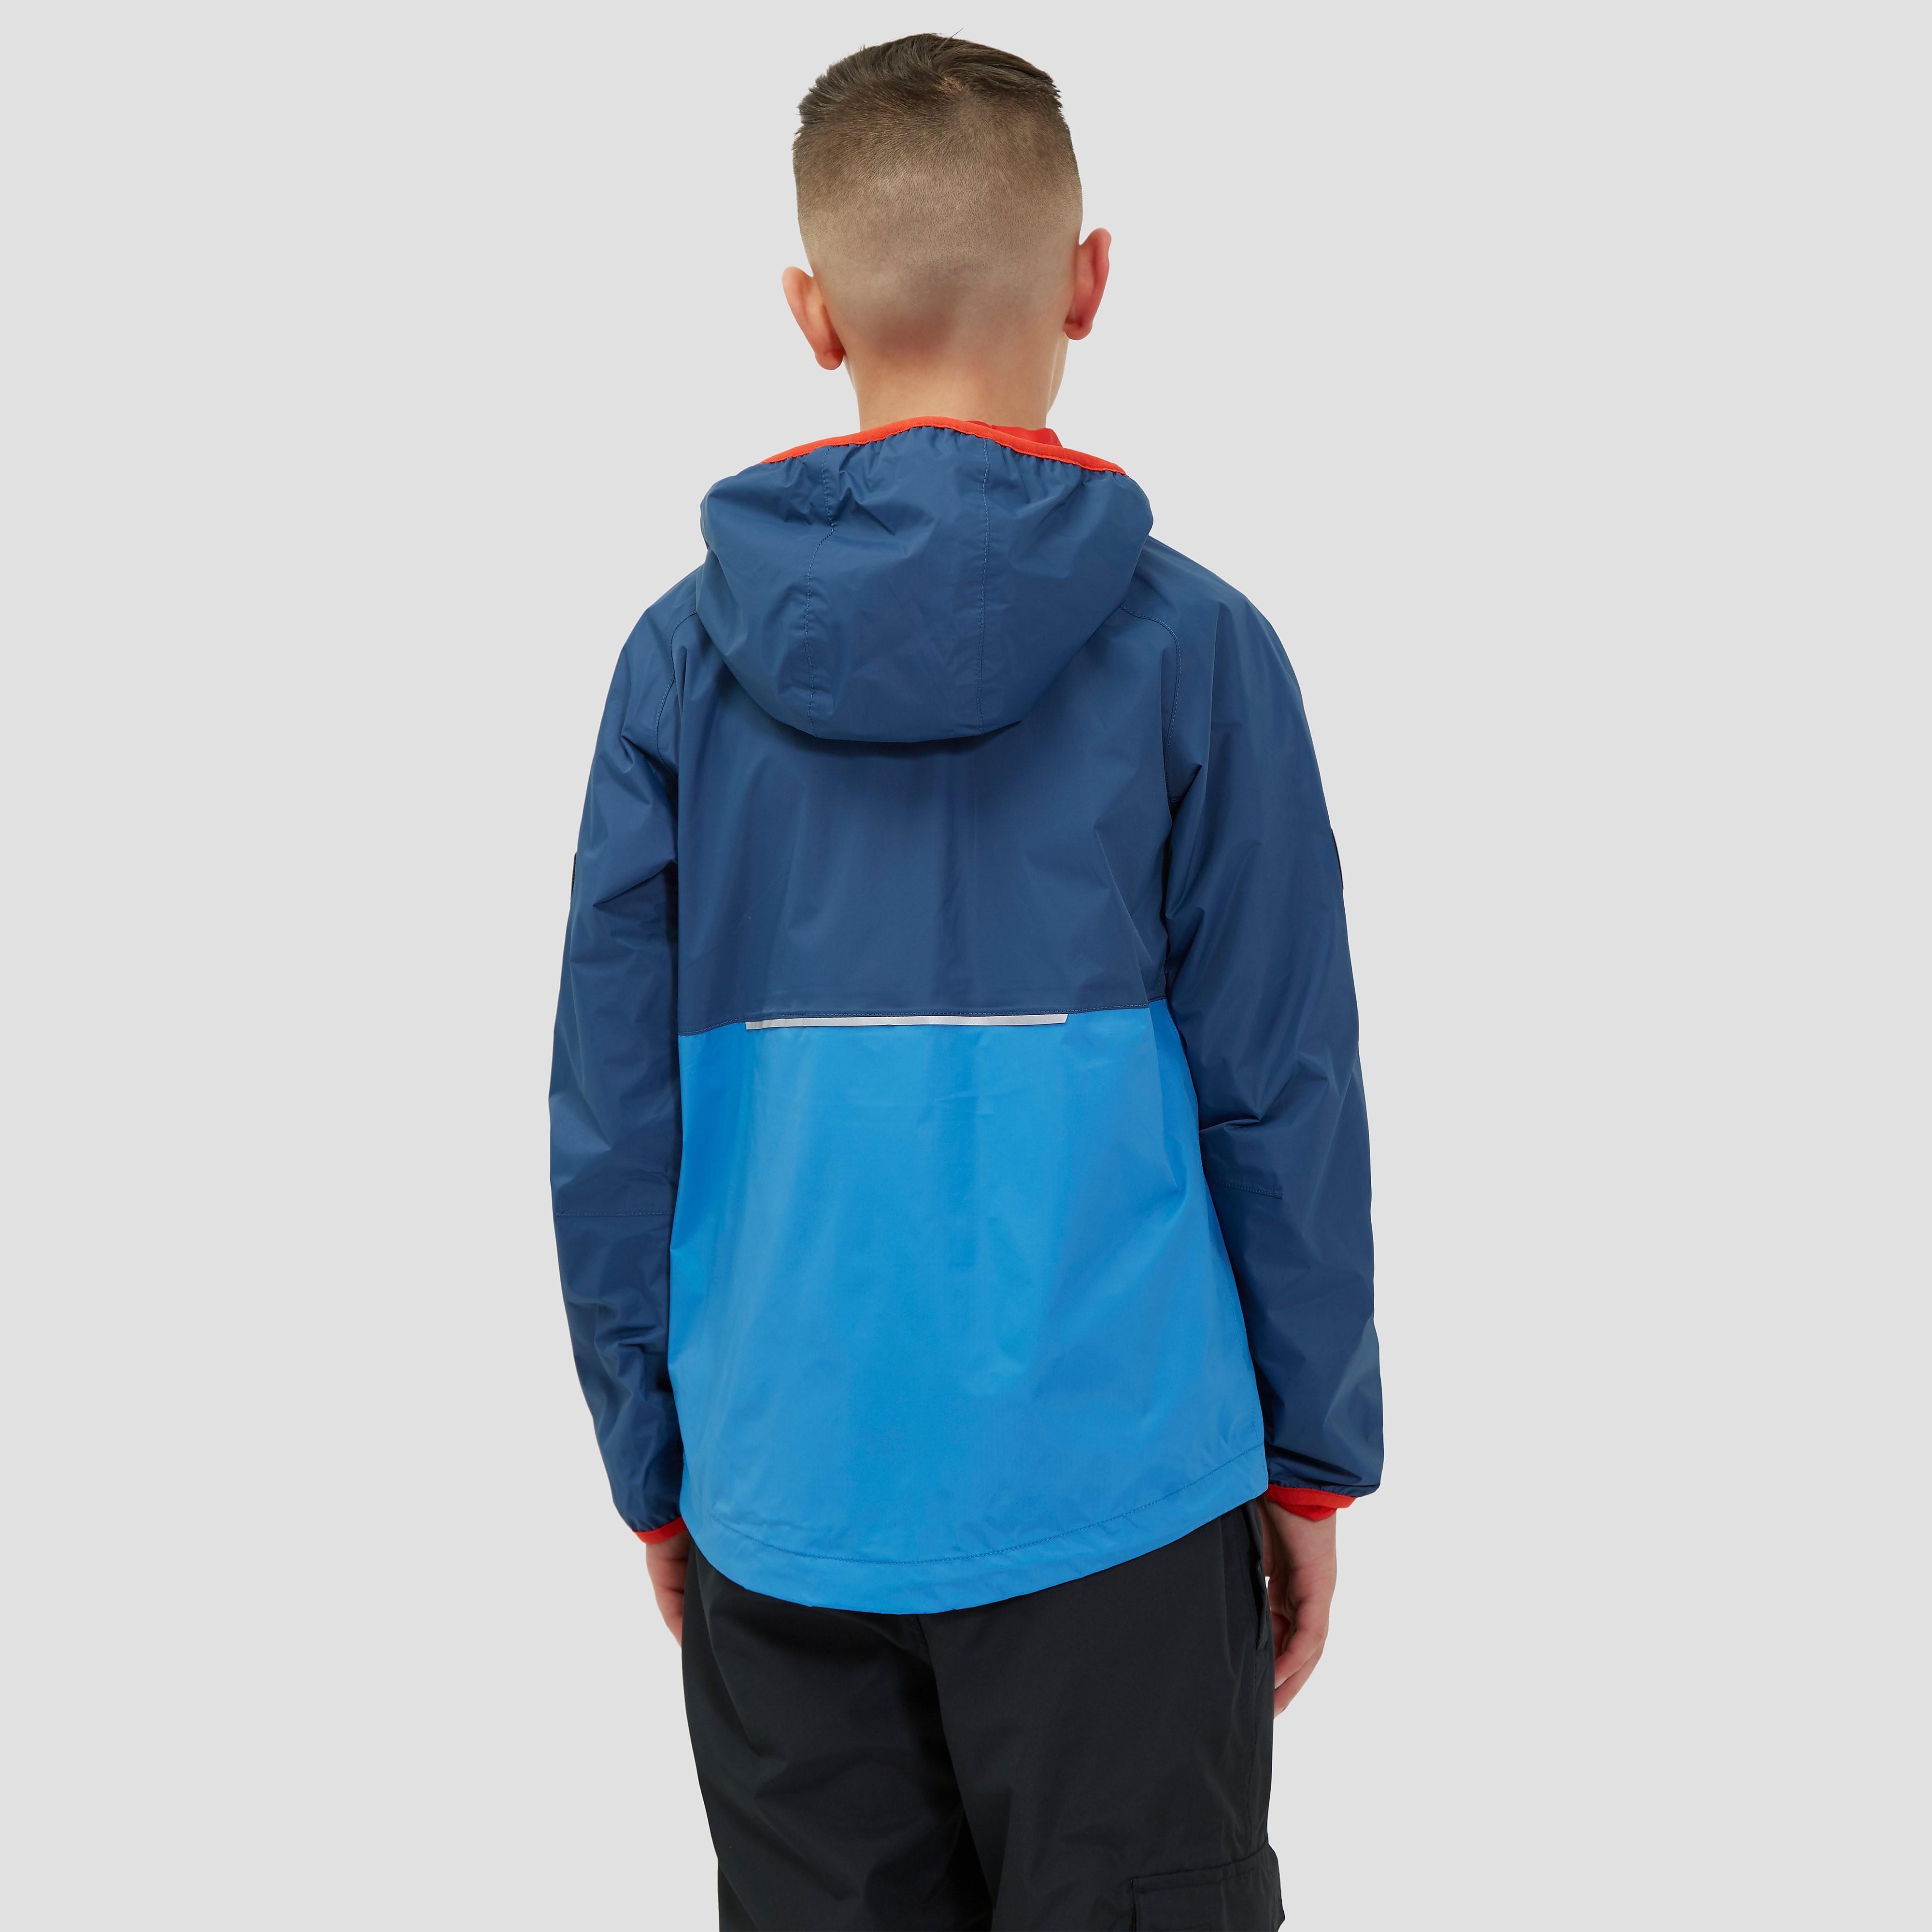 Jack Wolfskin Turbulence Junior Rain Jacket